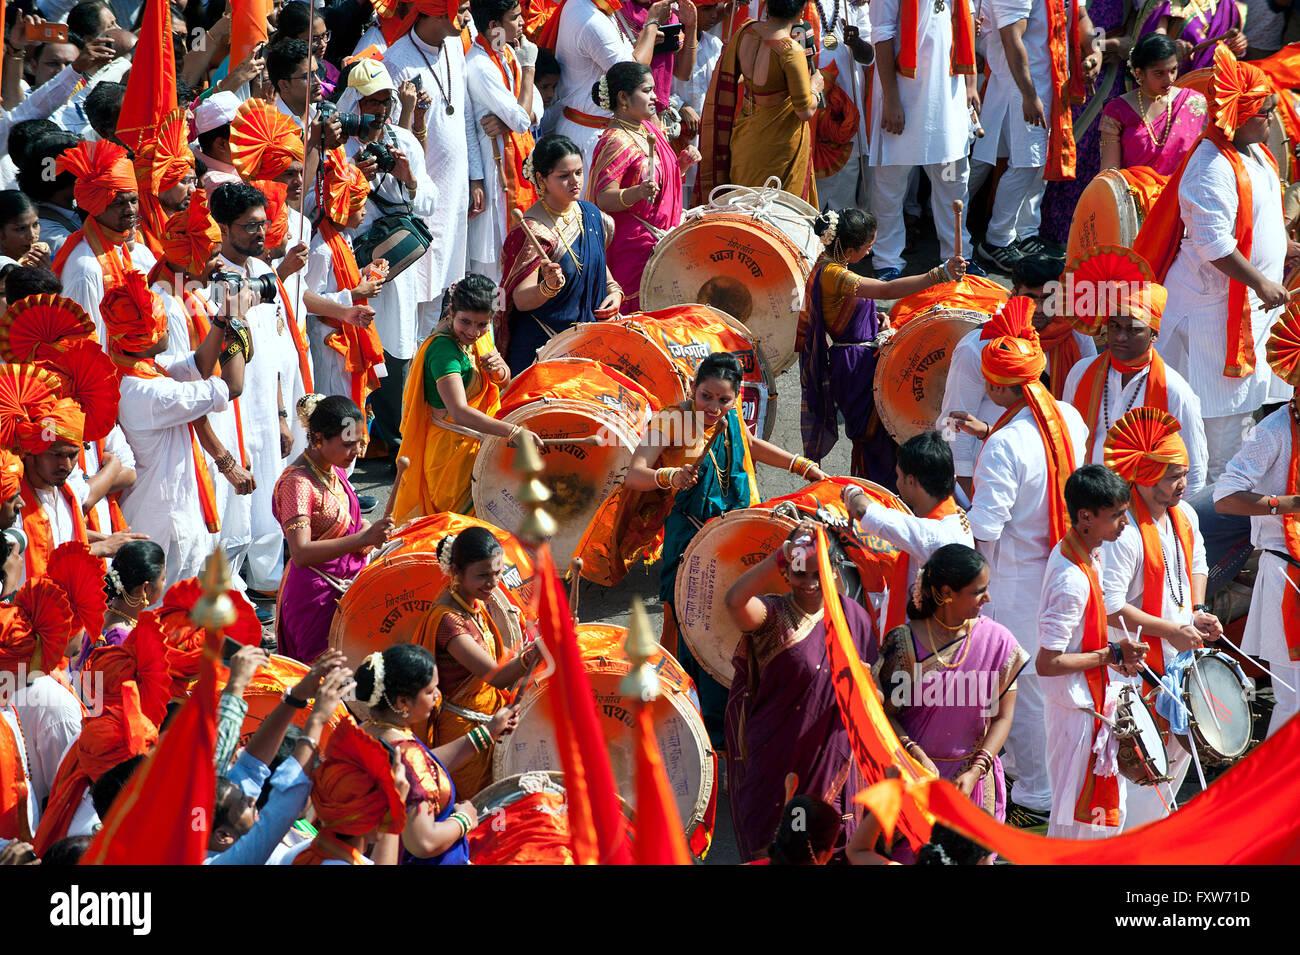 Ladies, Guddi Padwa Marathi New year procession - Stock Image